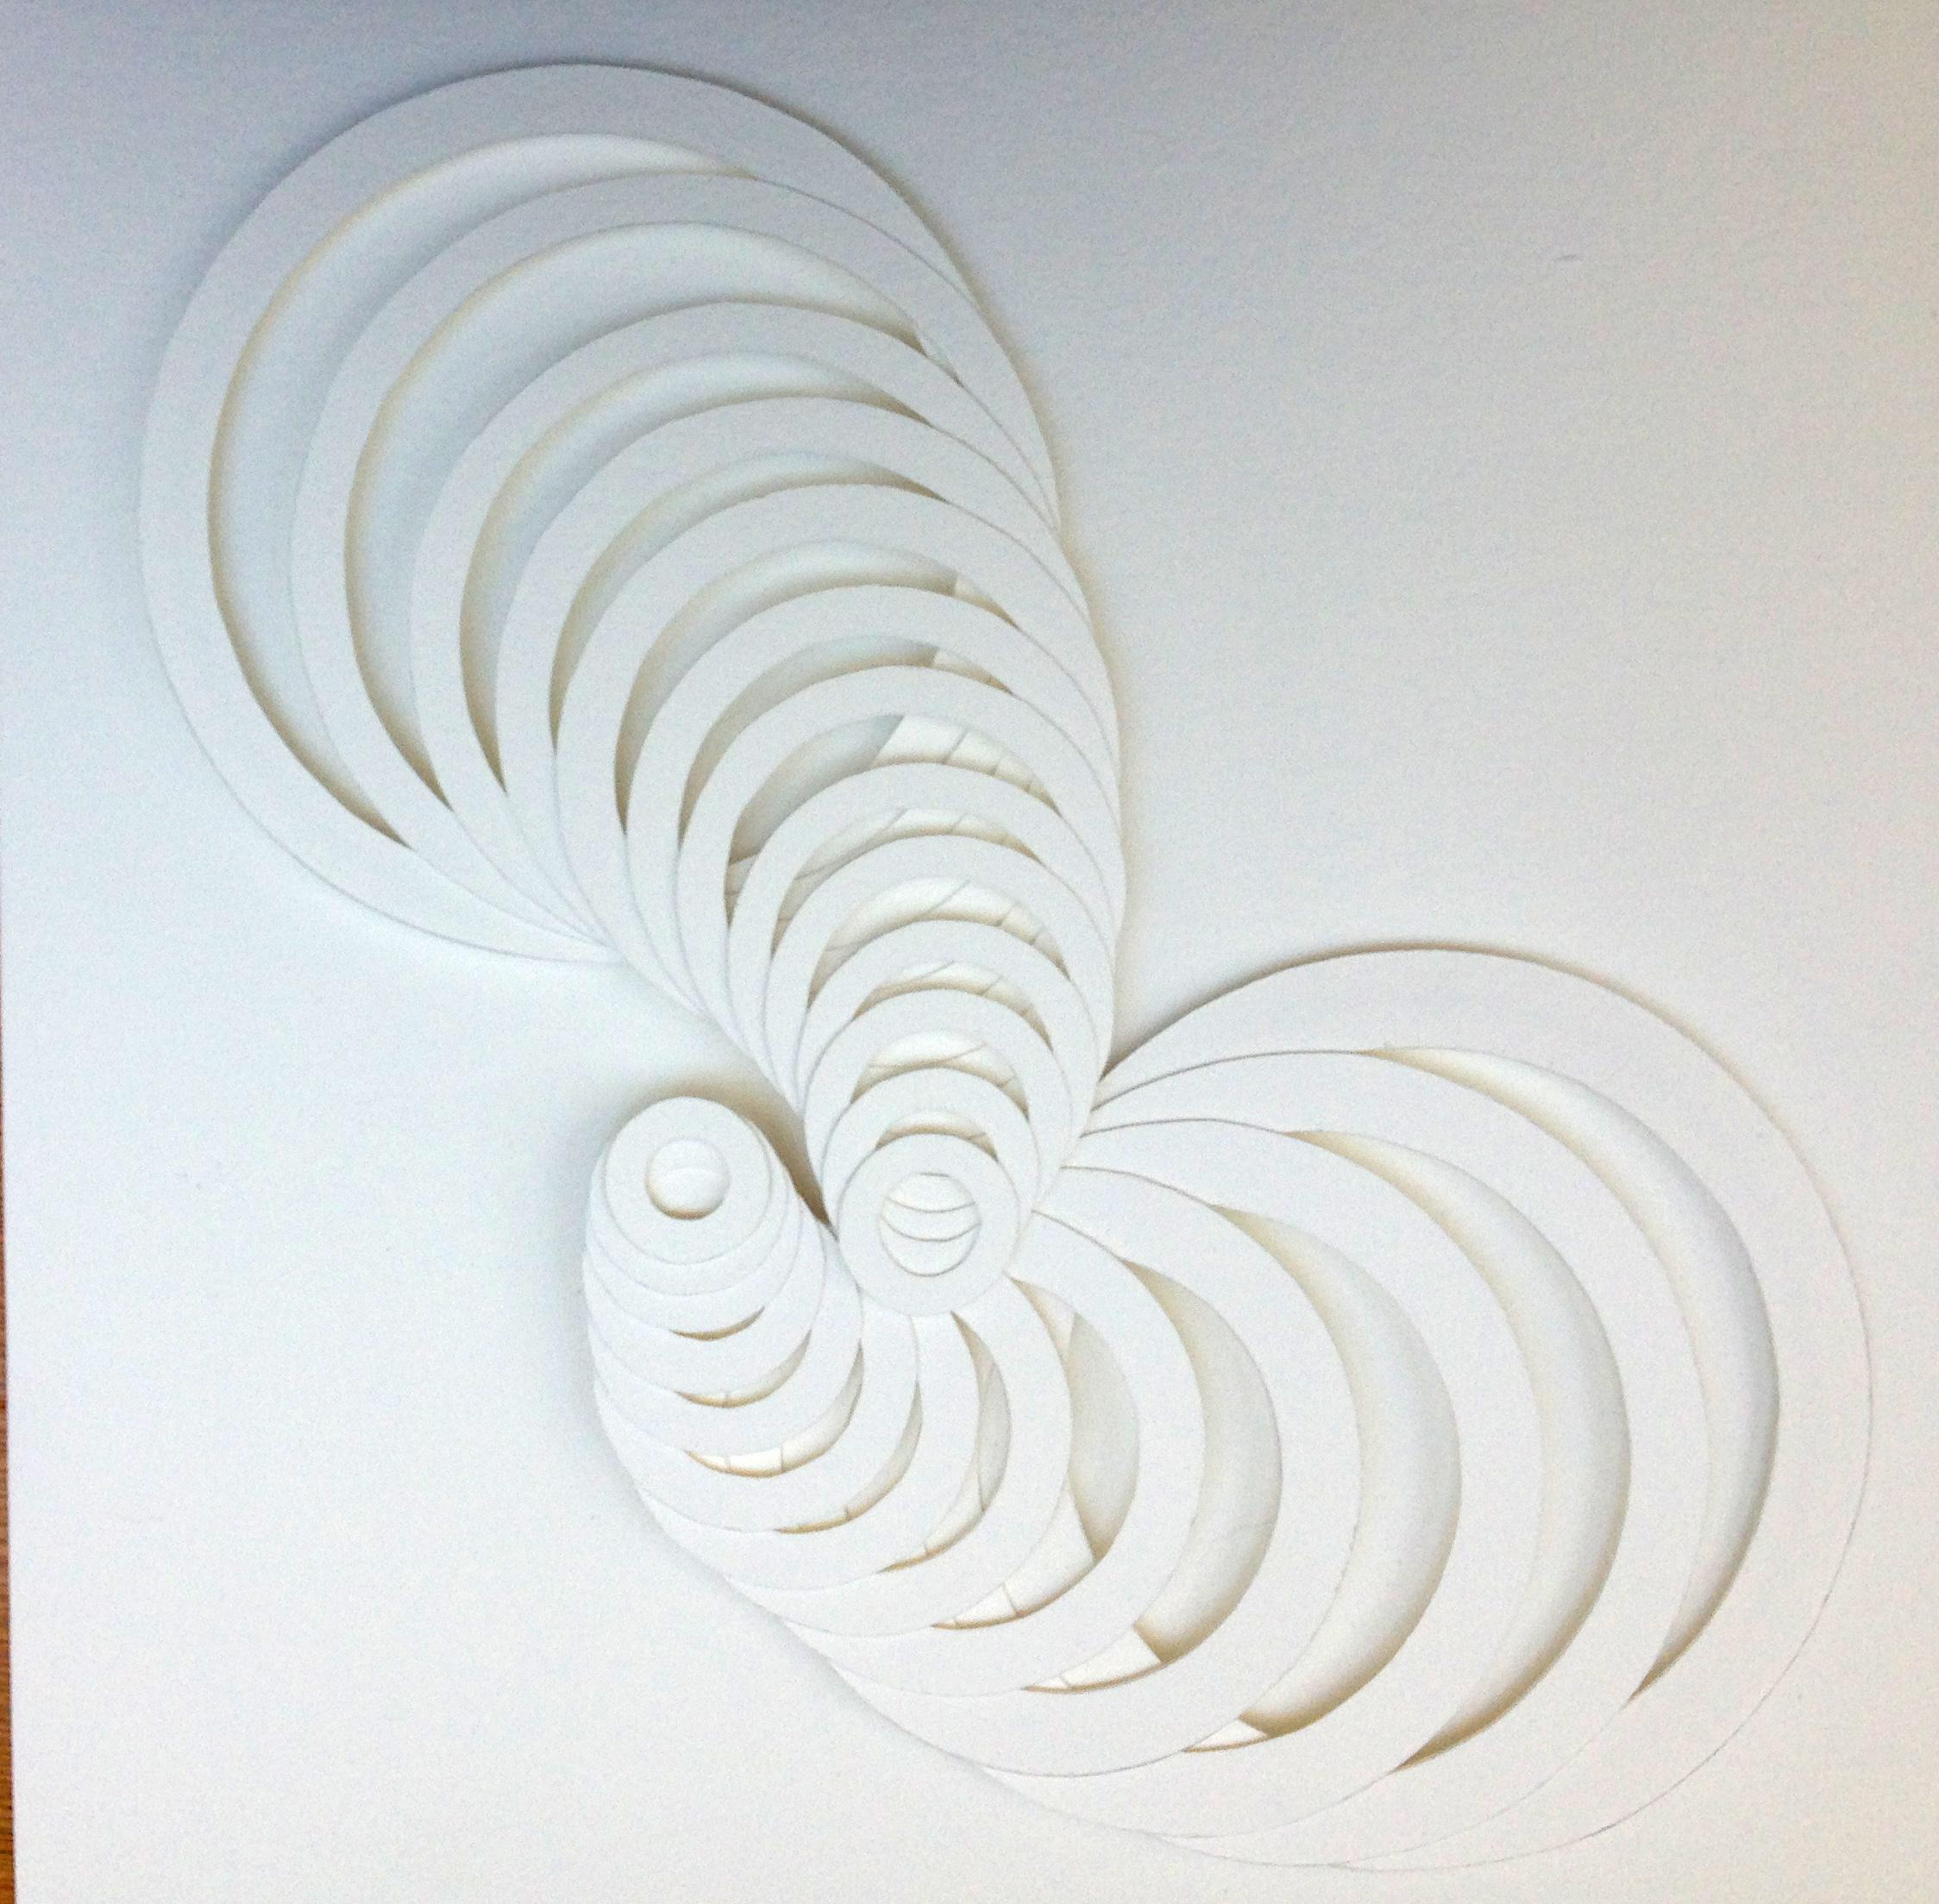 Expanding Circles 52 x 52cms